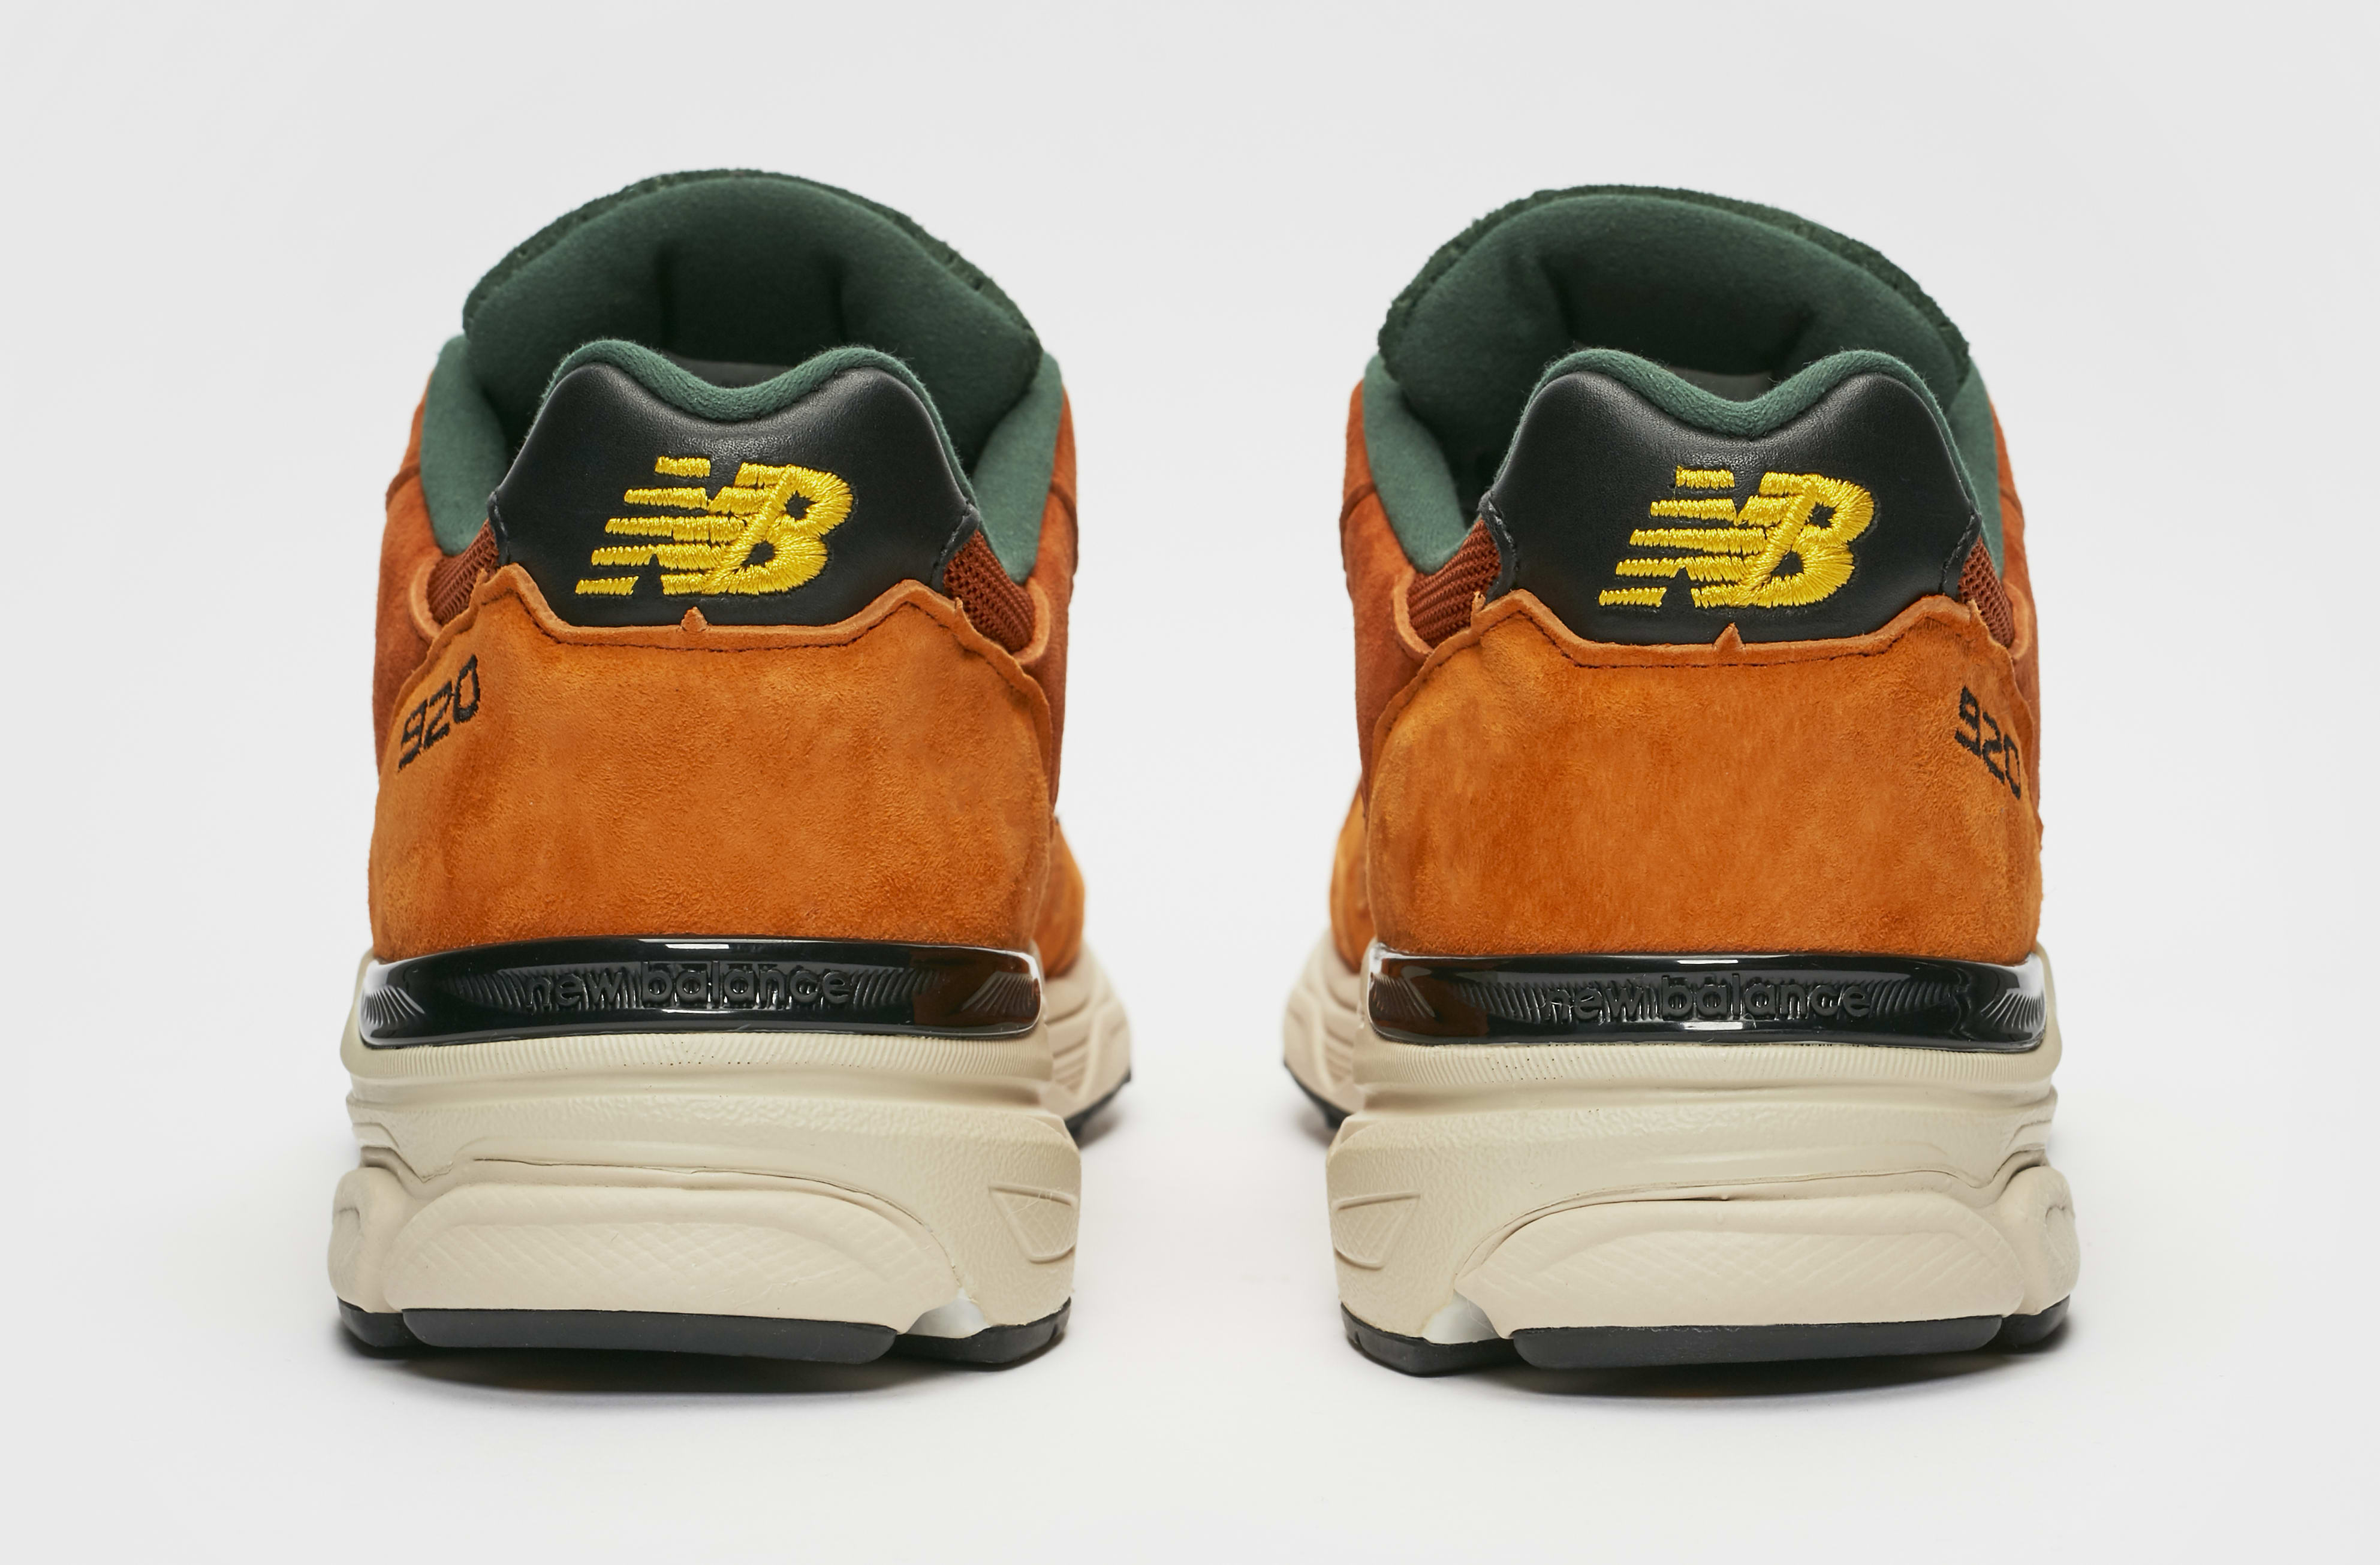 Sneakersnstuff x New Balance 920 'SNS Sports World' Heel